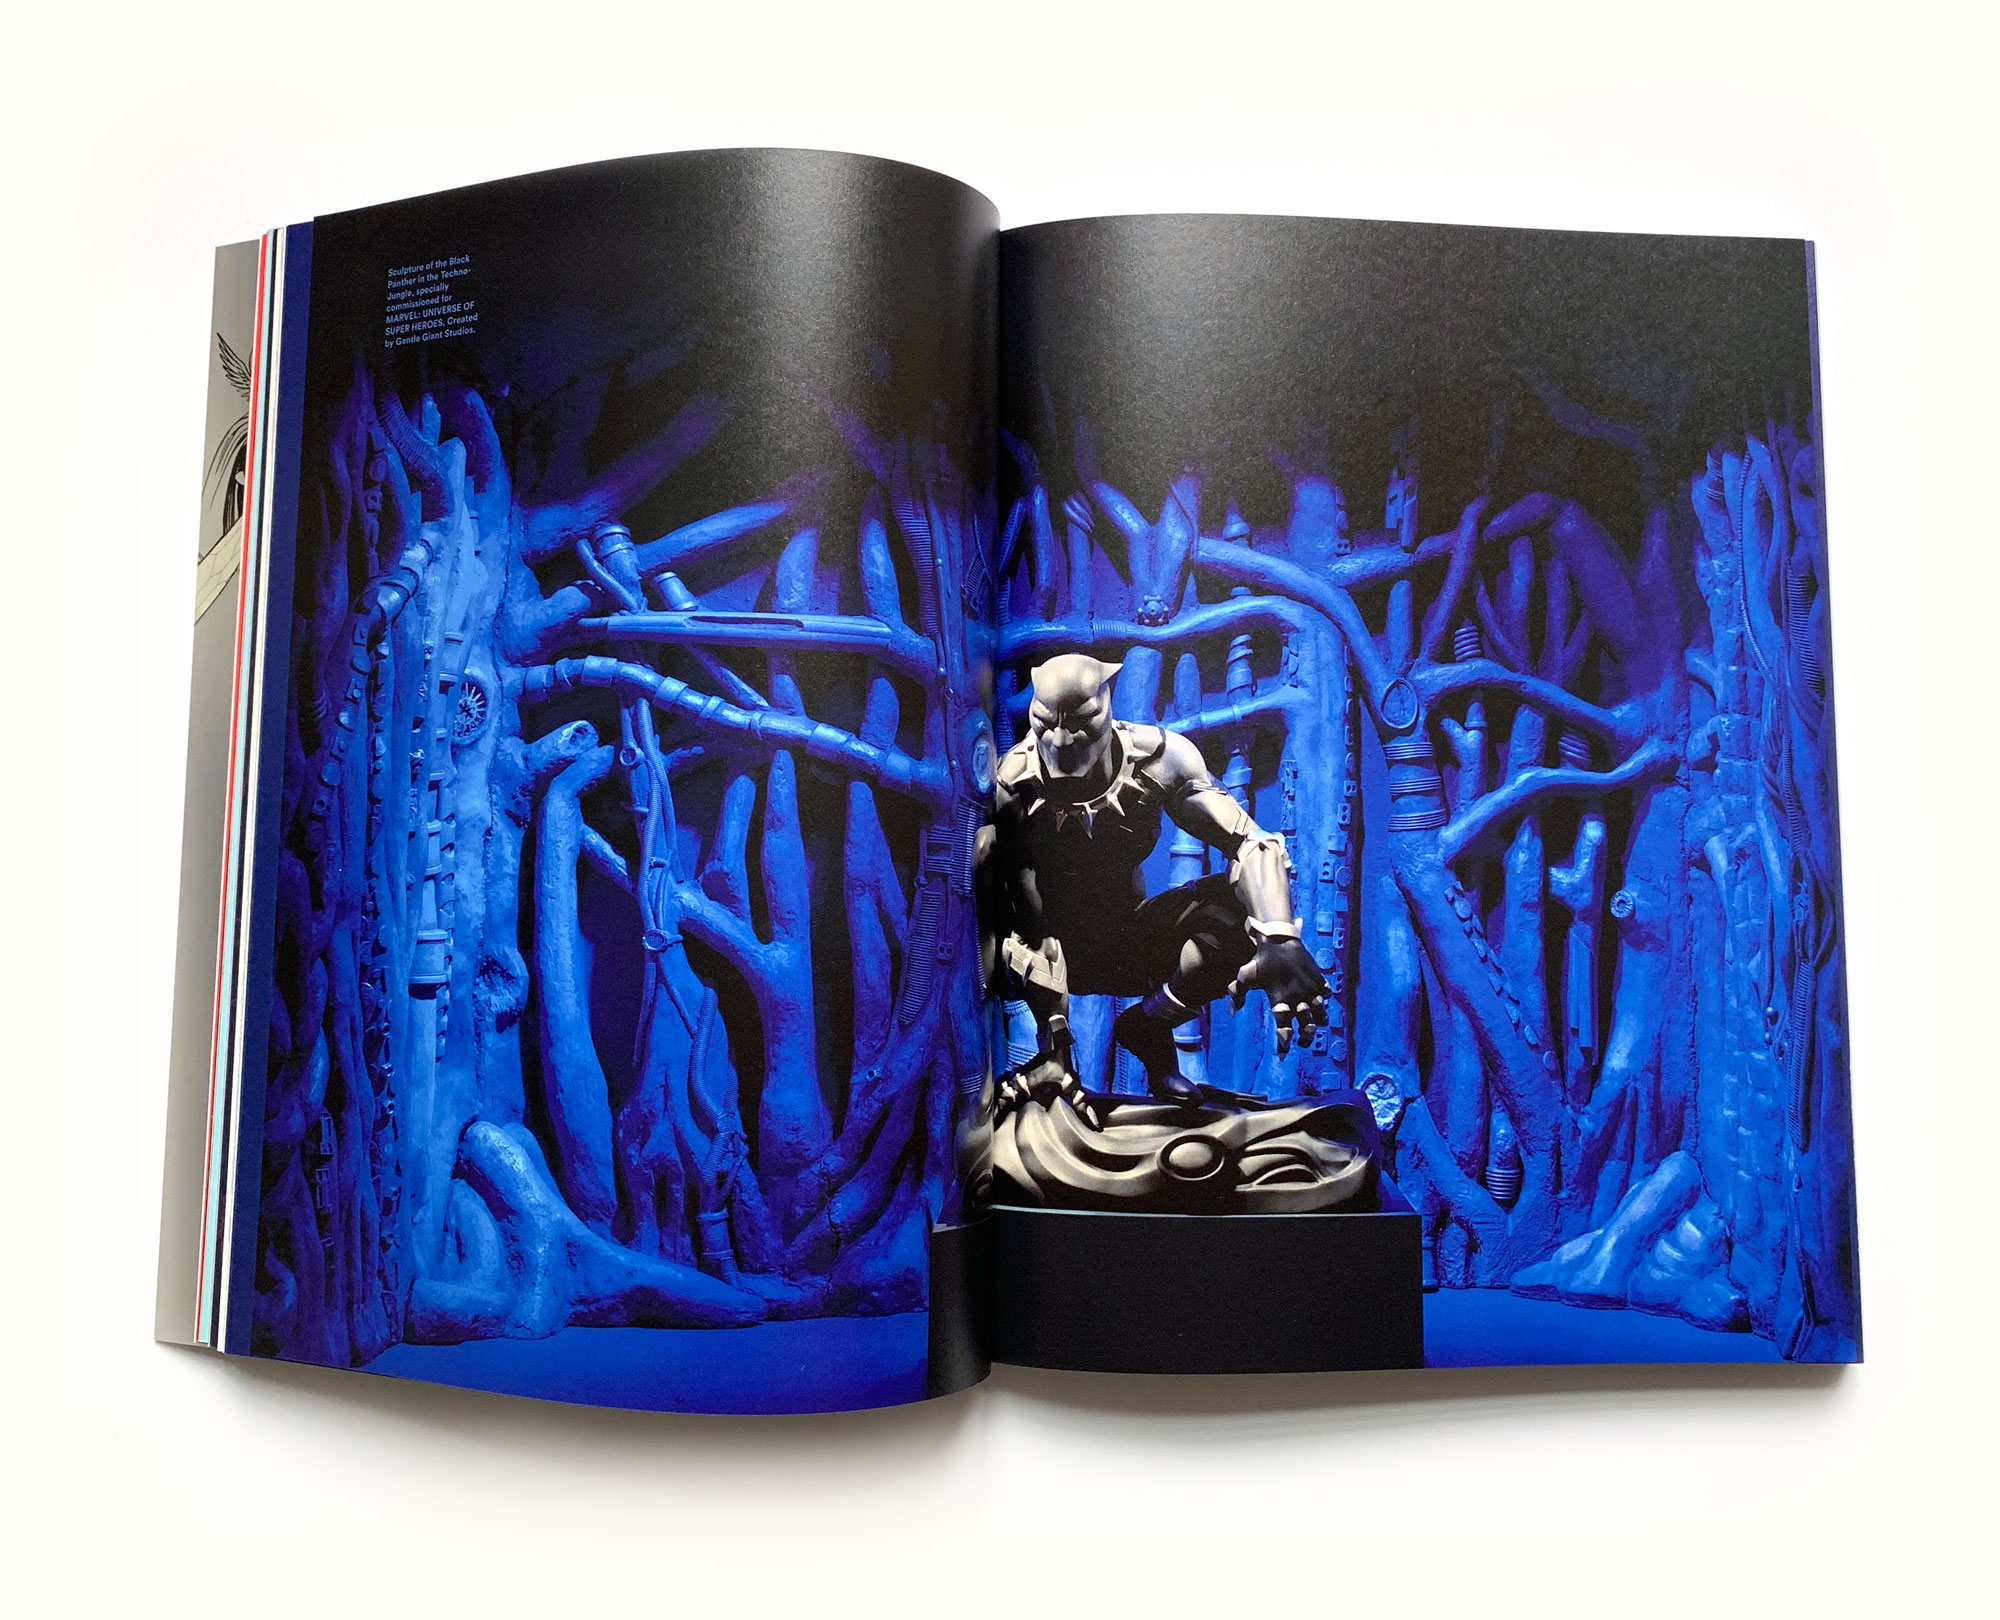 Marvel-Universe-of-Super-Heroes-Book-Balgavy-Avengers-BlackPanther2.jpg